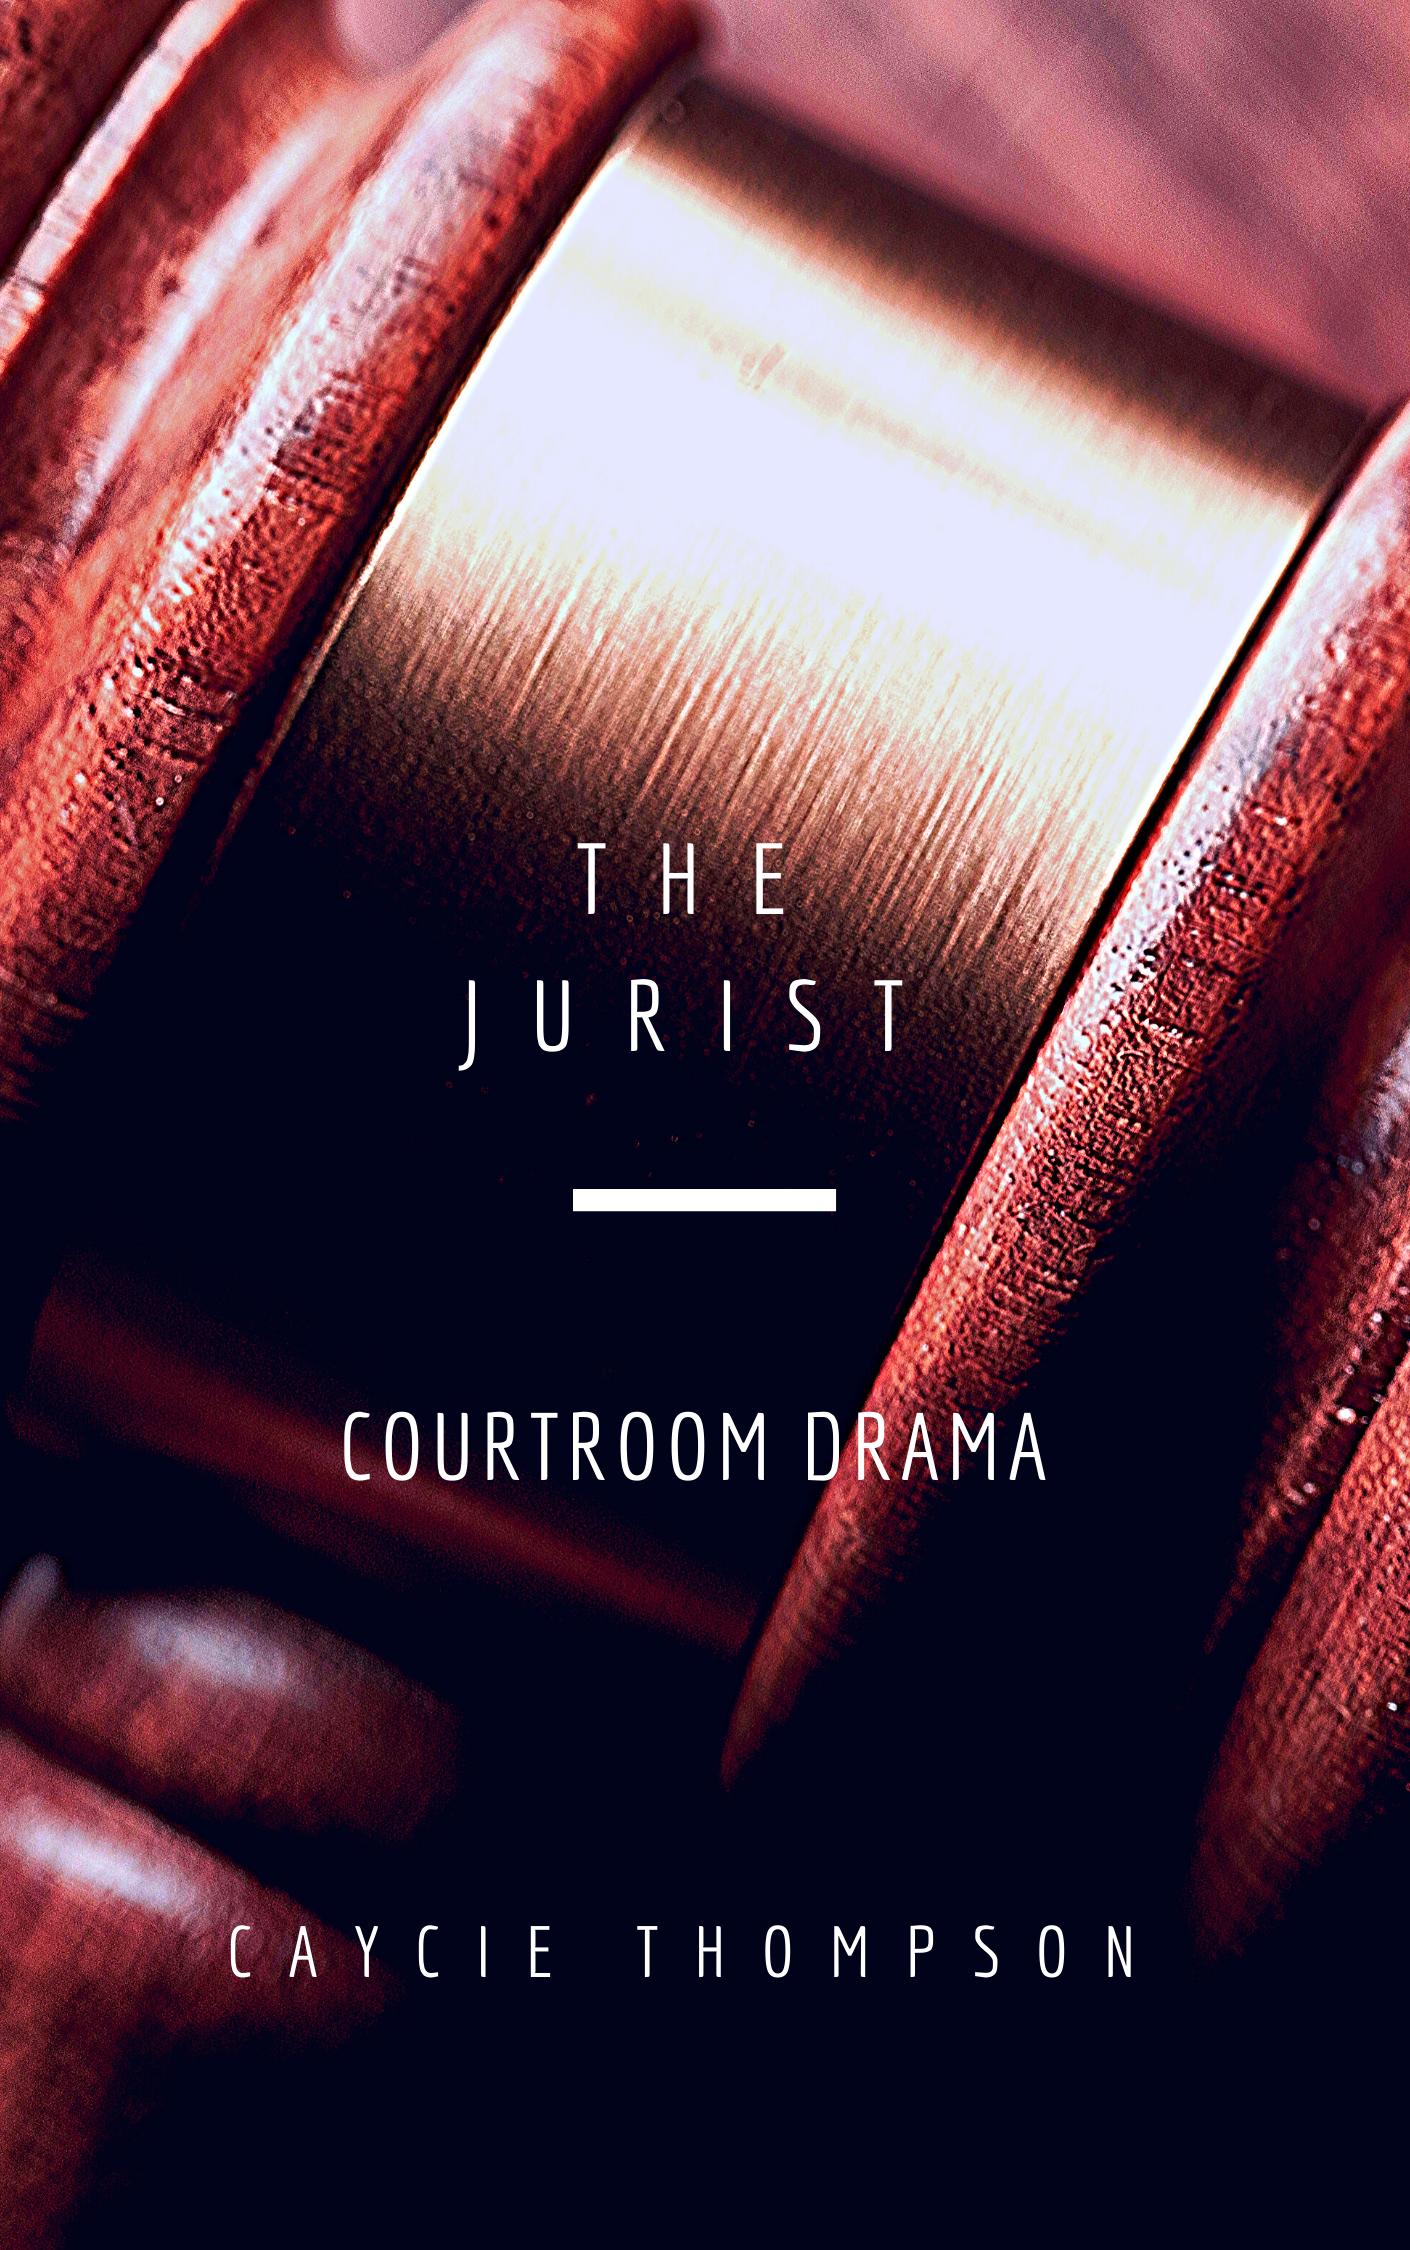 The Jurist / Courtroom Drama